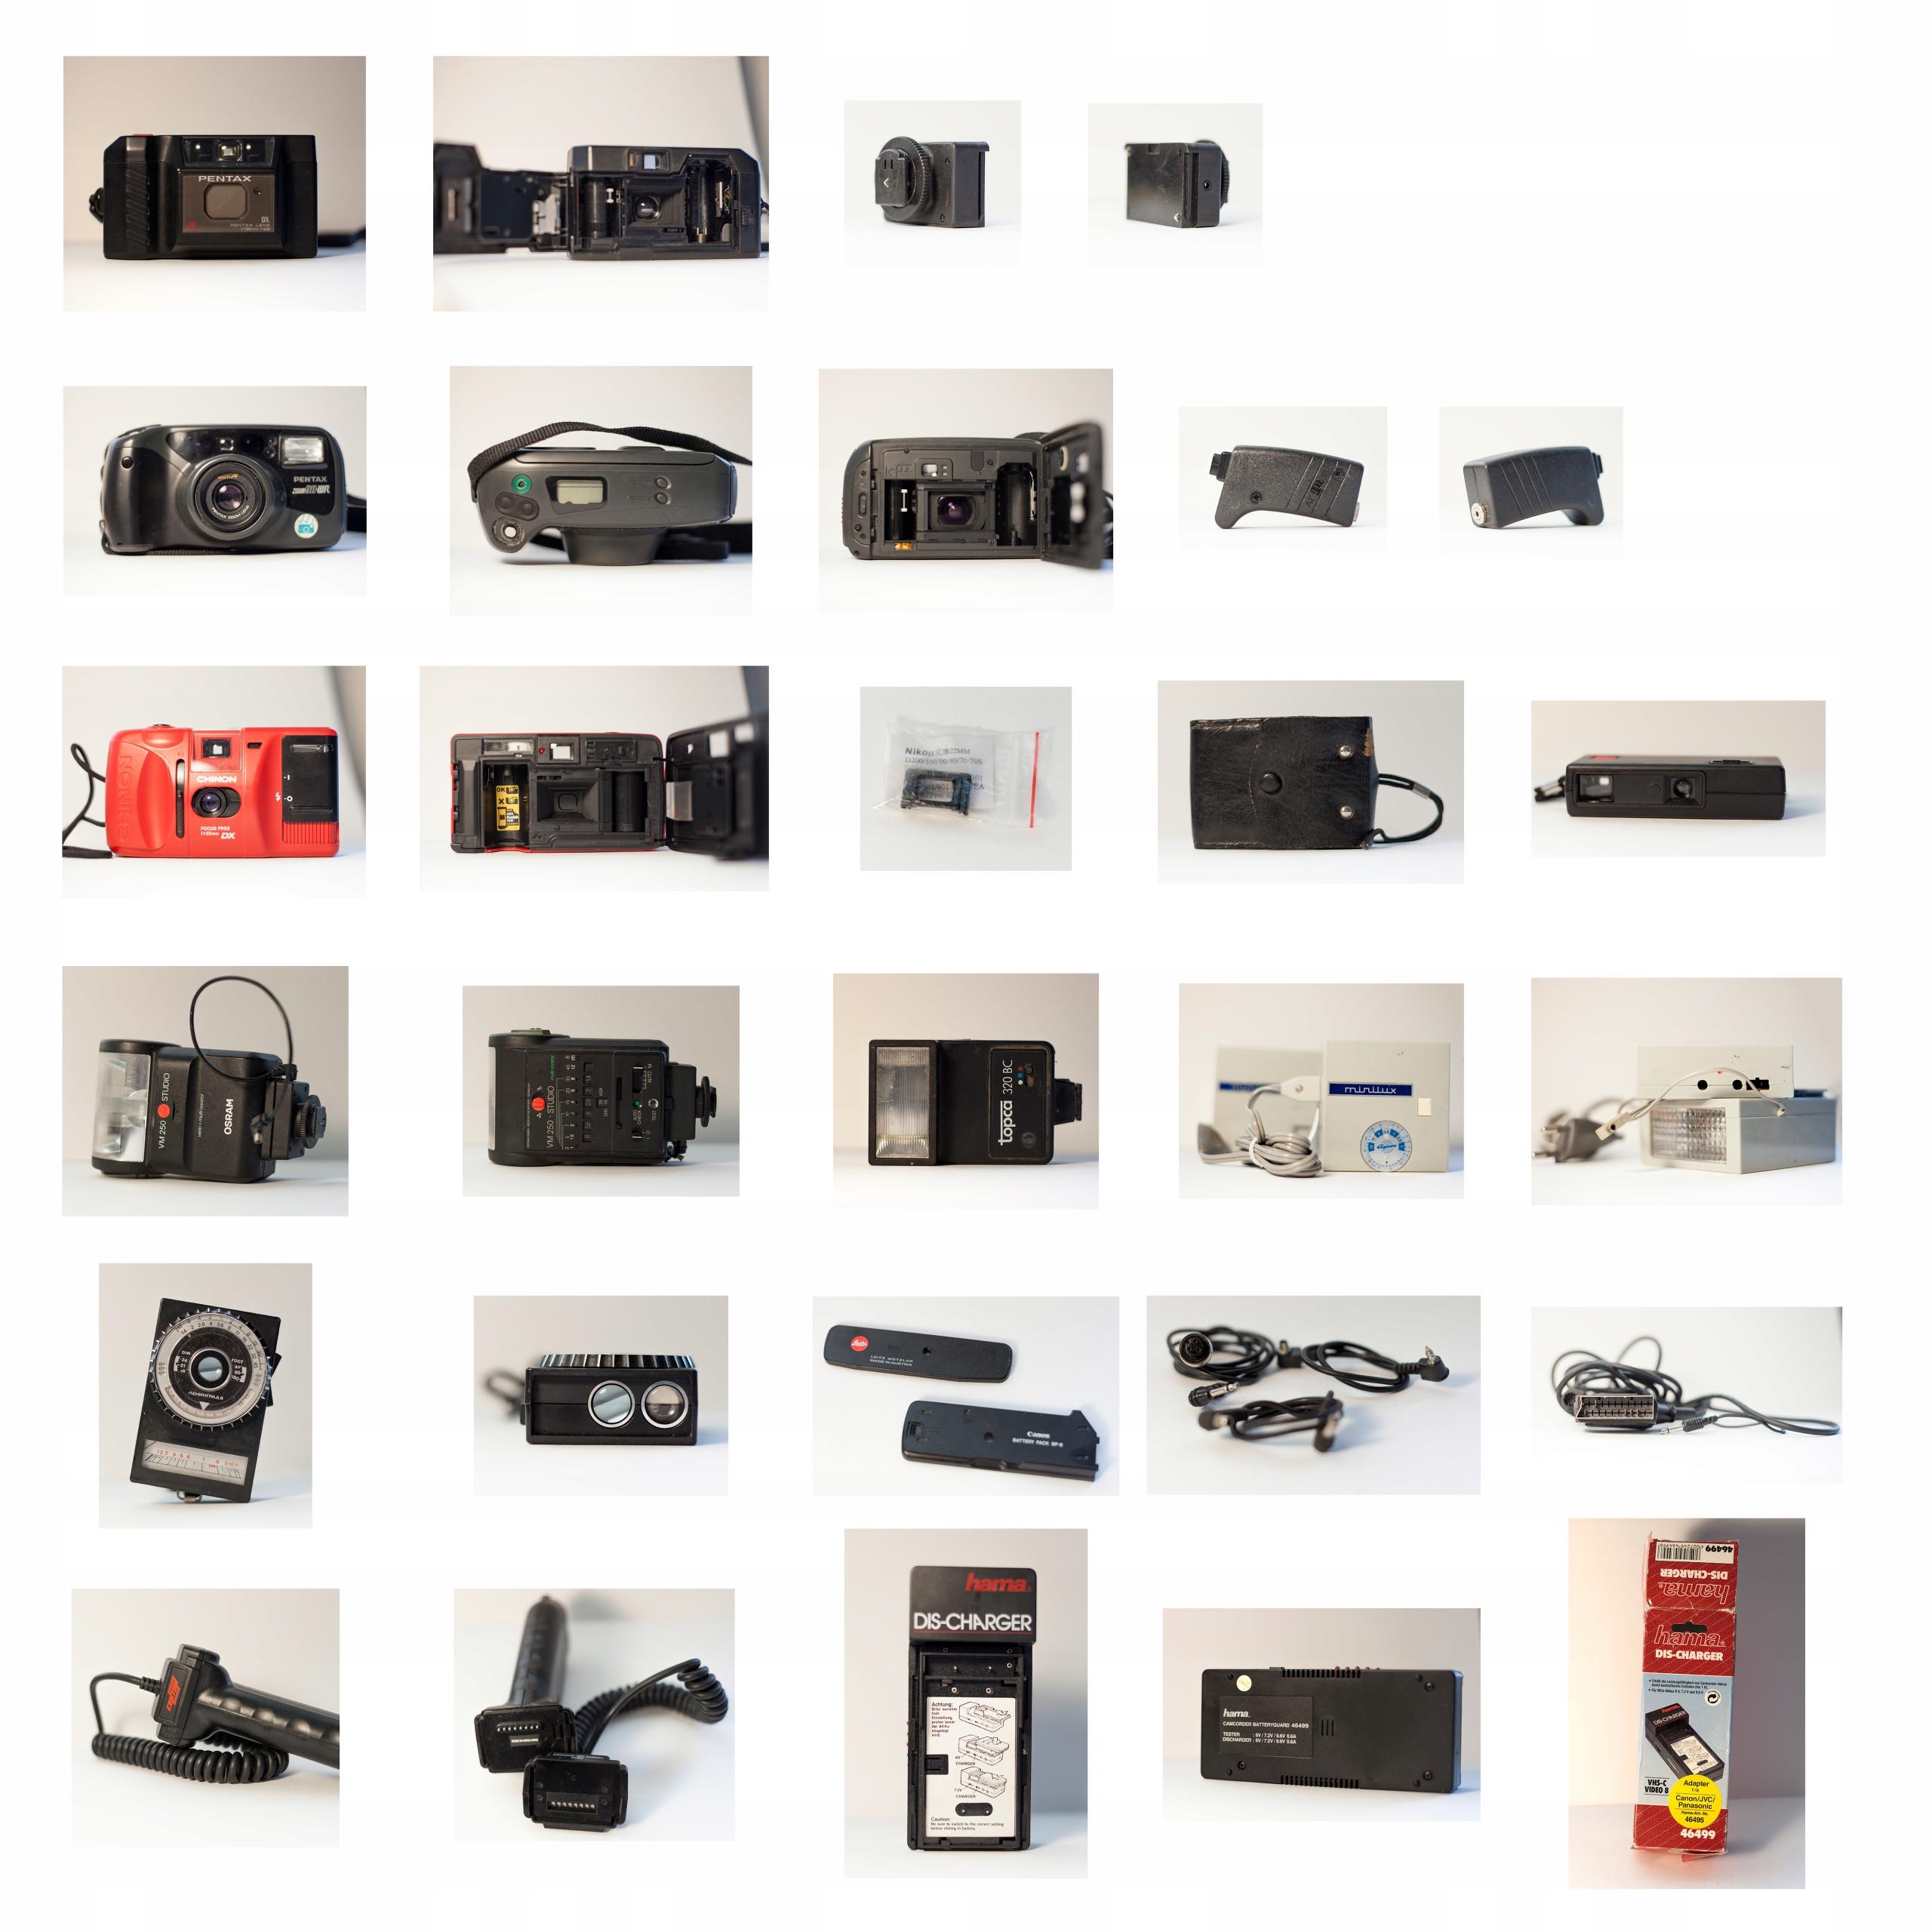 4 aparaty (Pentax, Chinon) + duży zestaw akc.